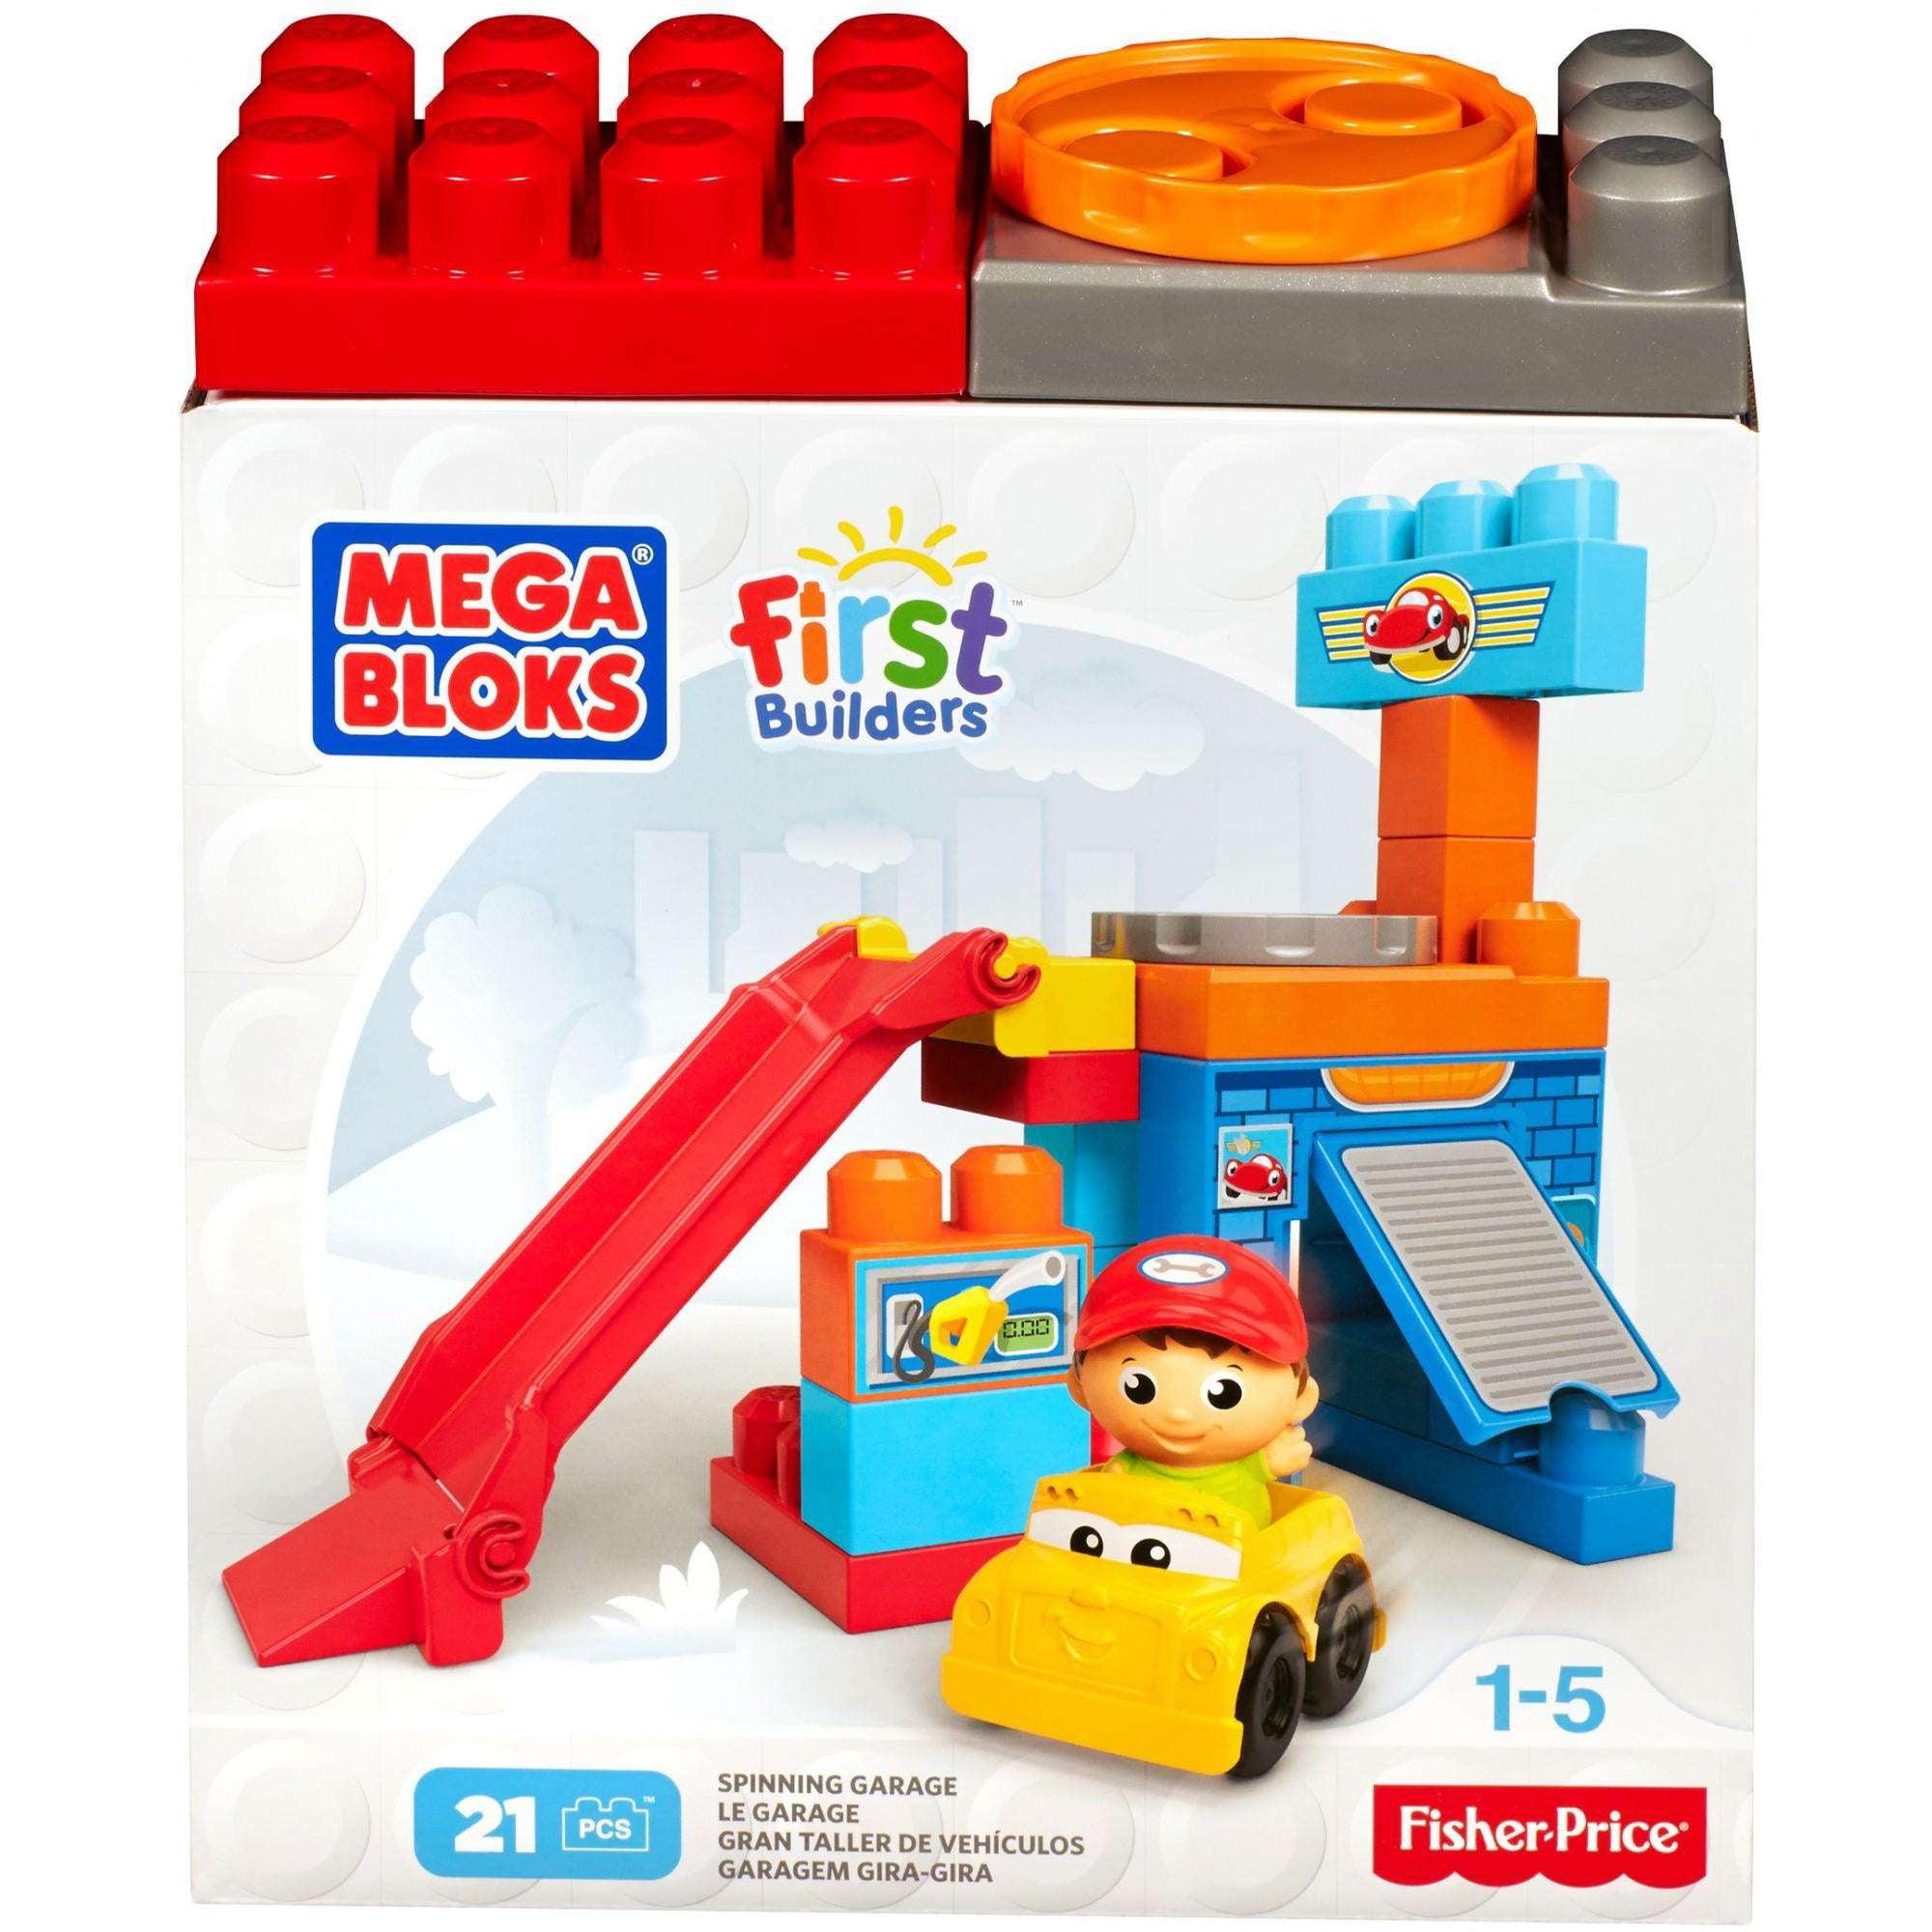 Mega Bloks First Builders Spin 'n Play Spinning Garage Playset by Mattel